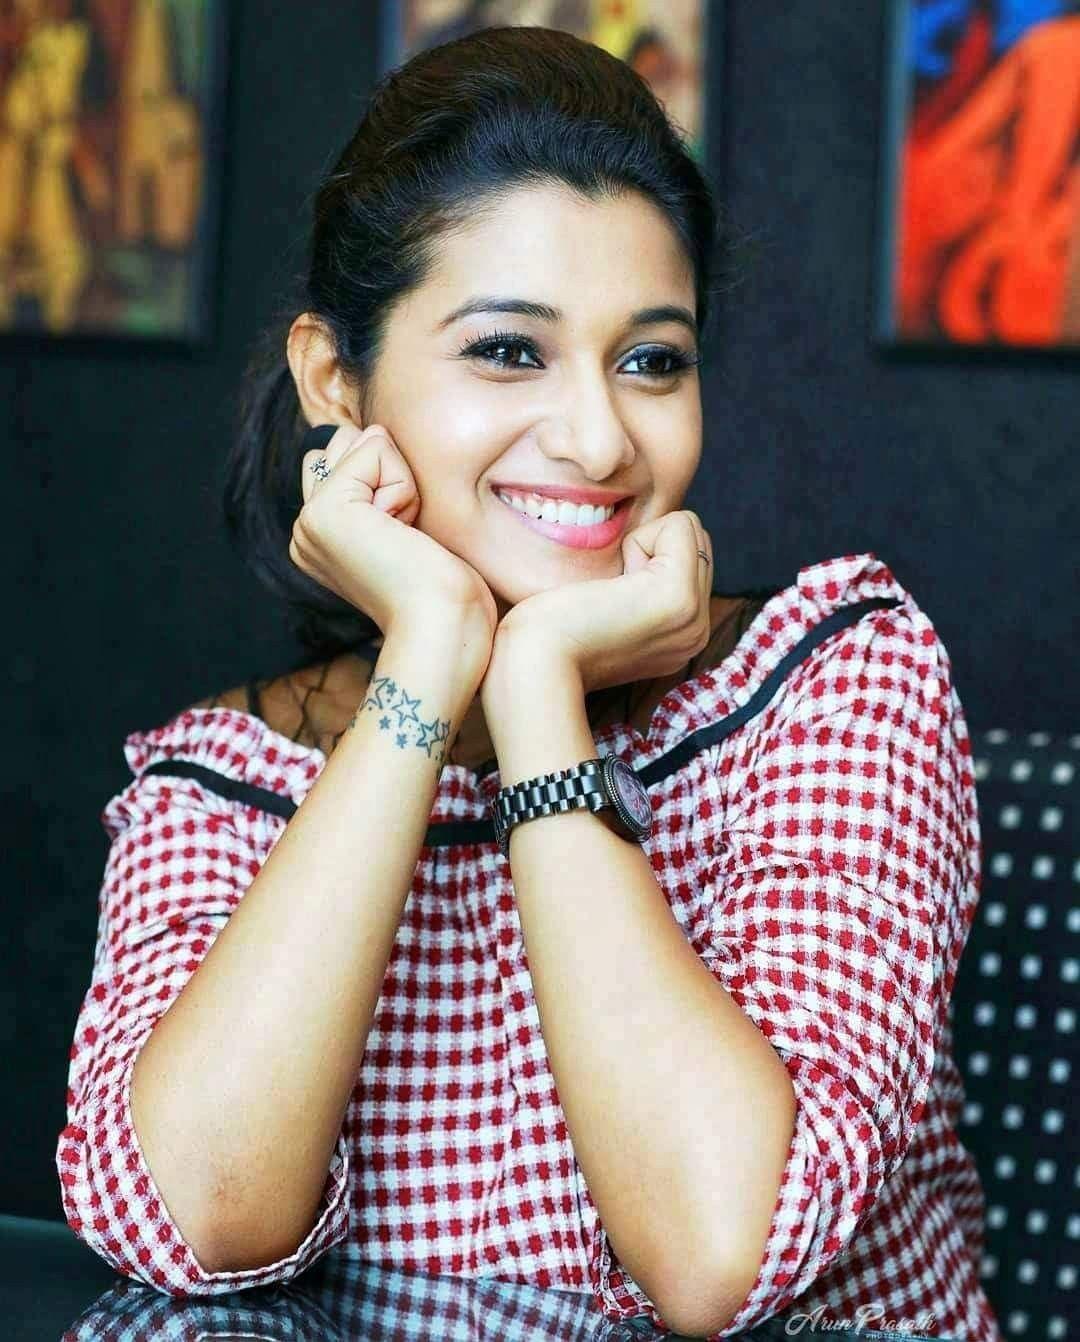 Actress Priya Bhavani Shankar Latest Photo Stills: Pin By Praveen Telugu On Priya Bhavani Shankar In 2019